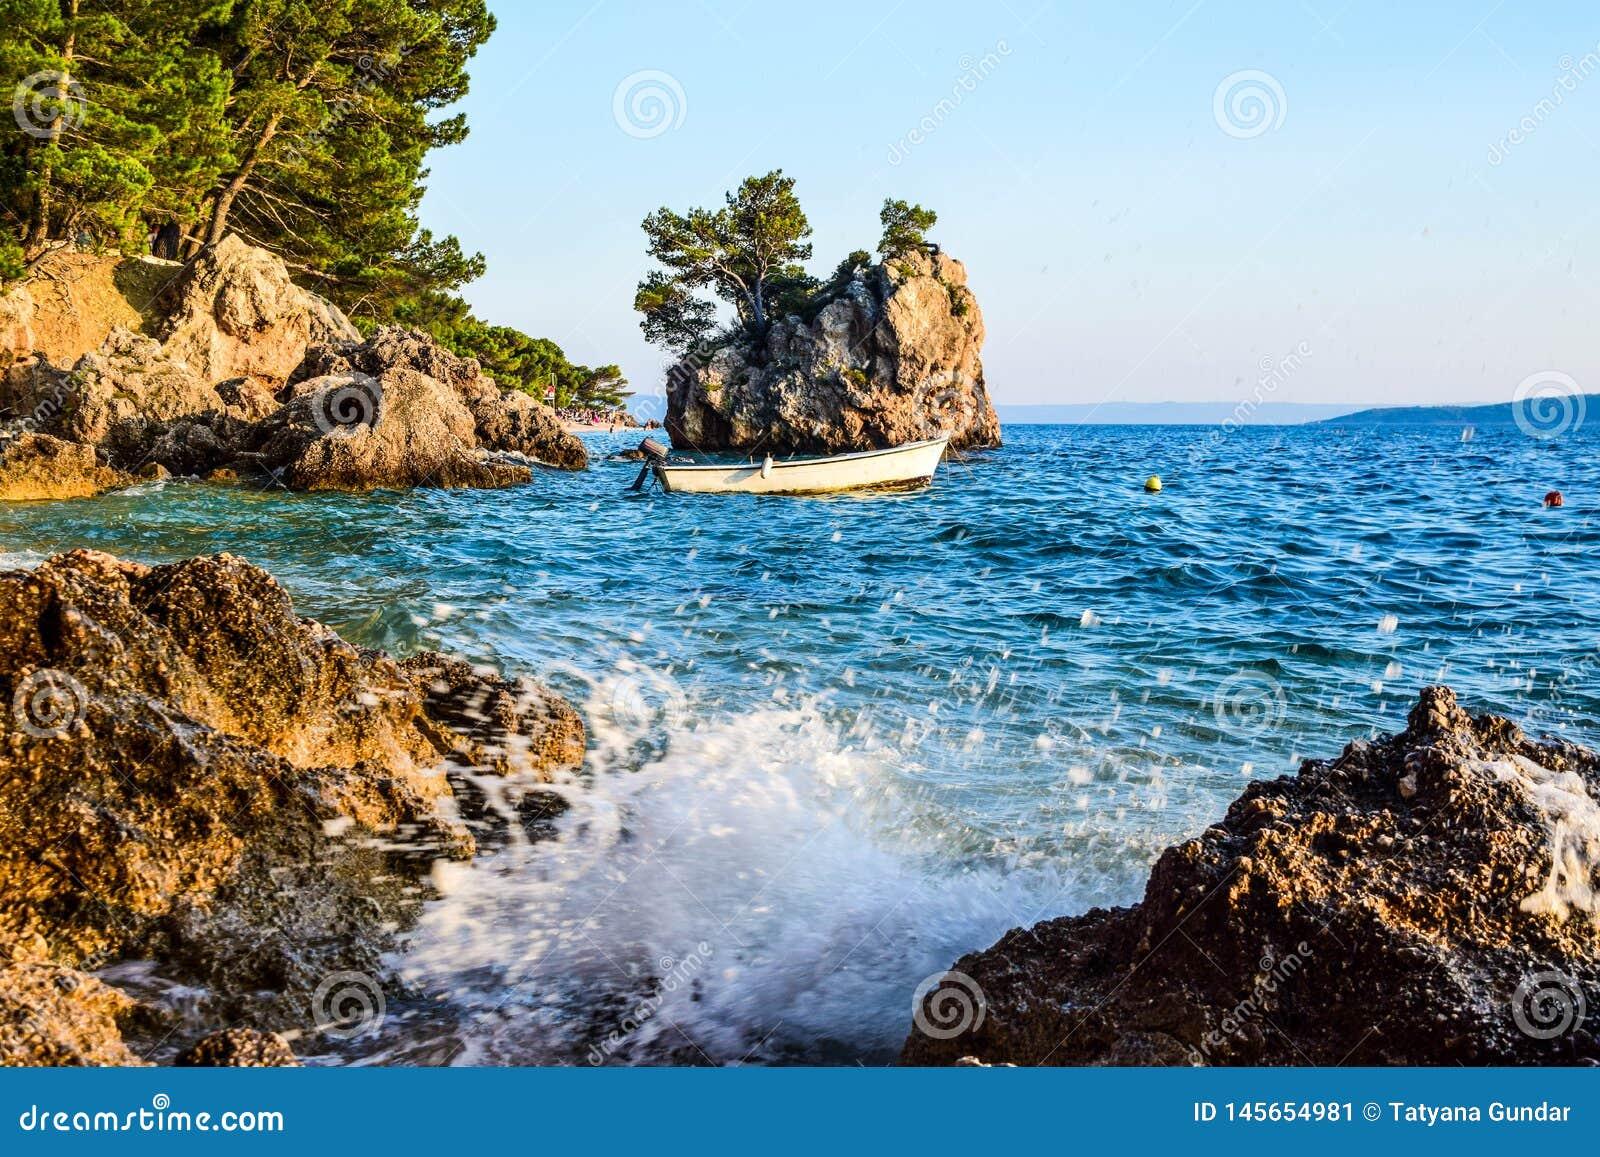 Brela rock, Croatia